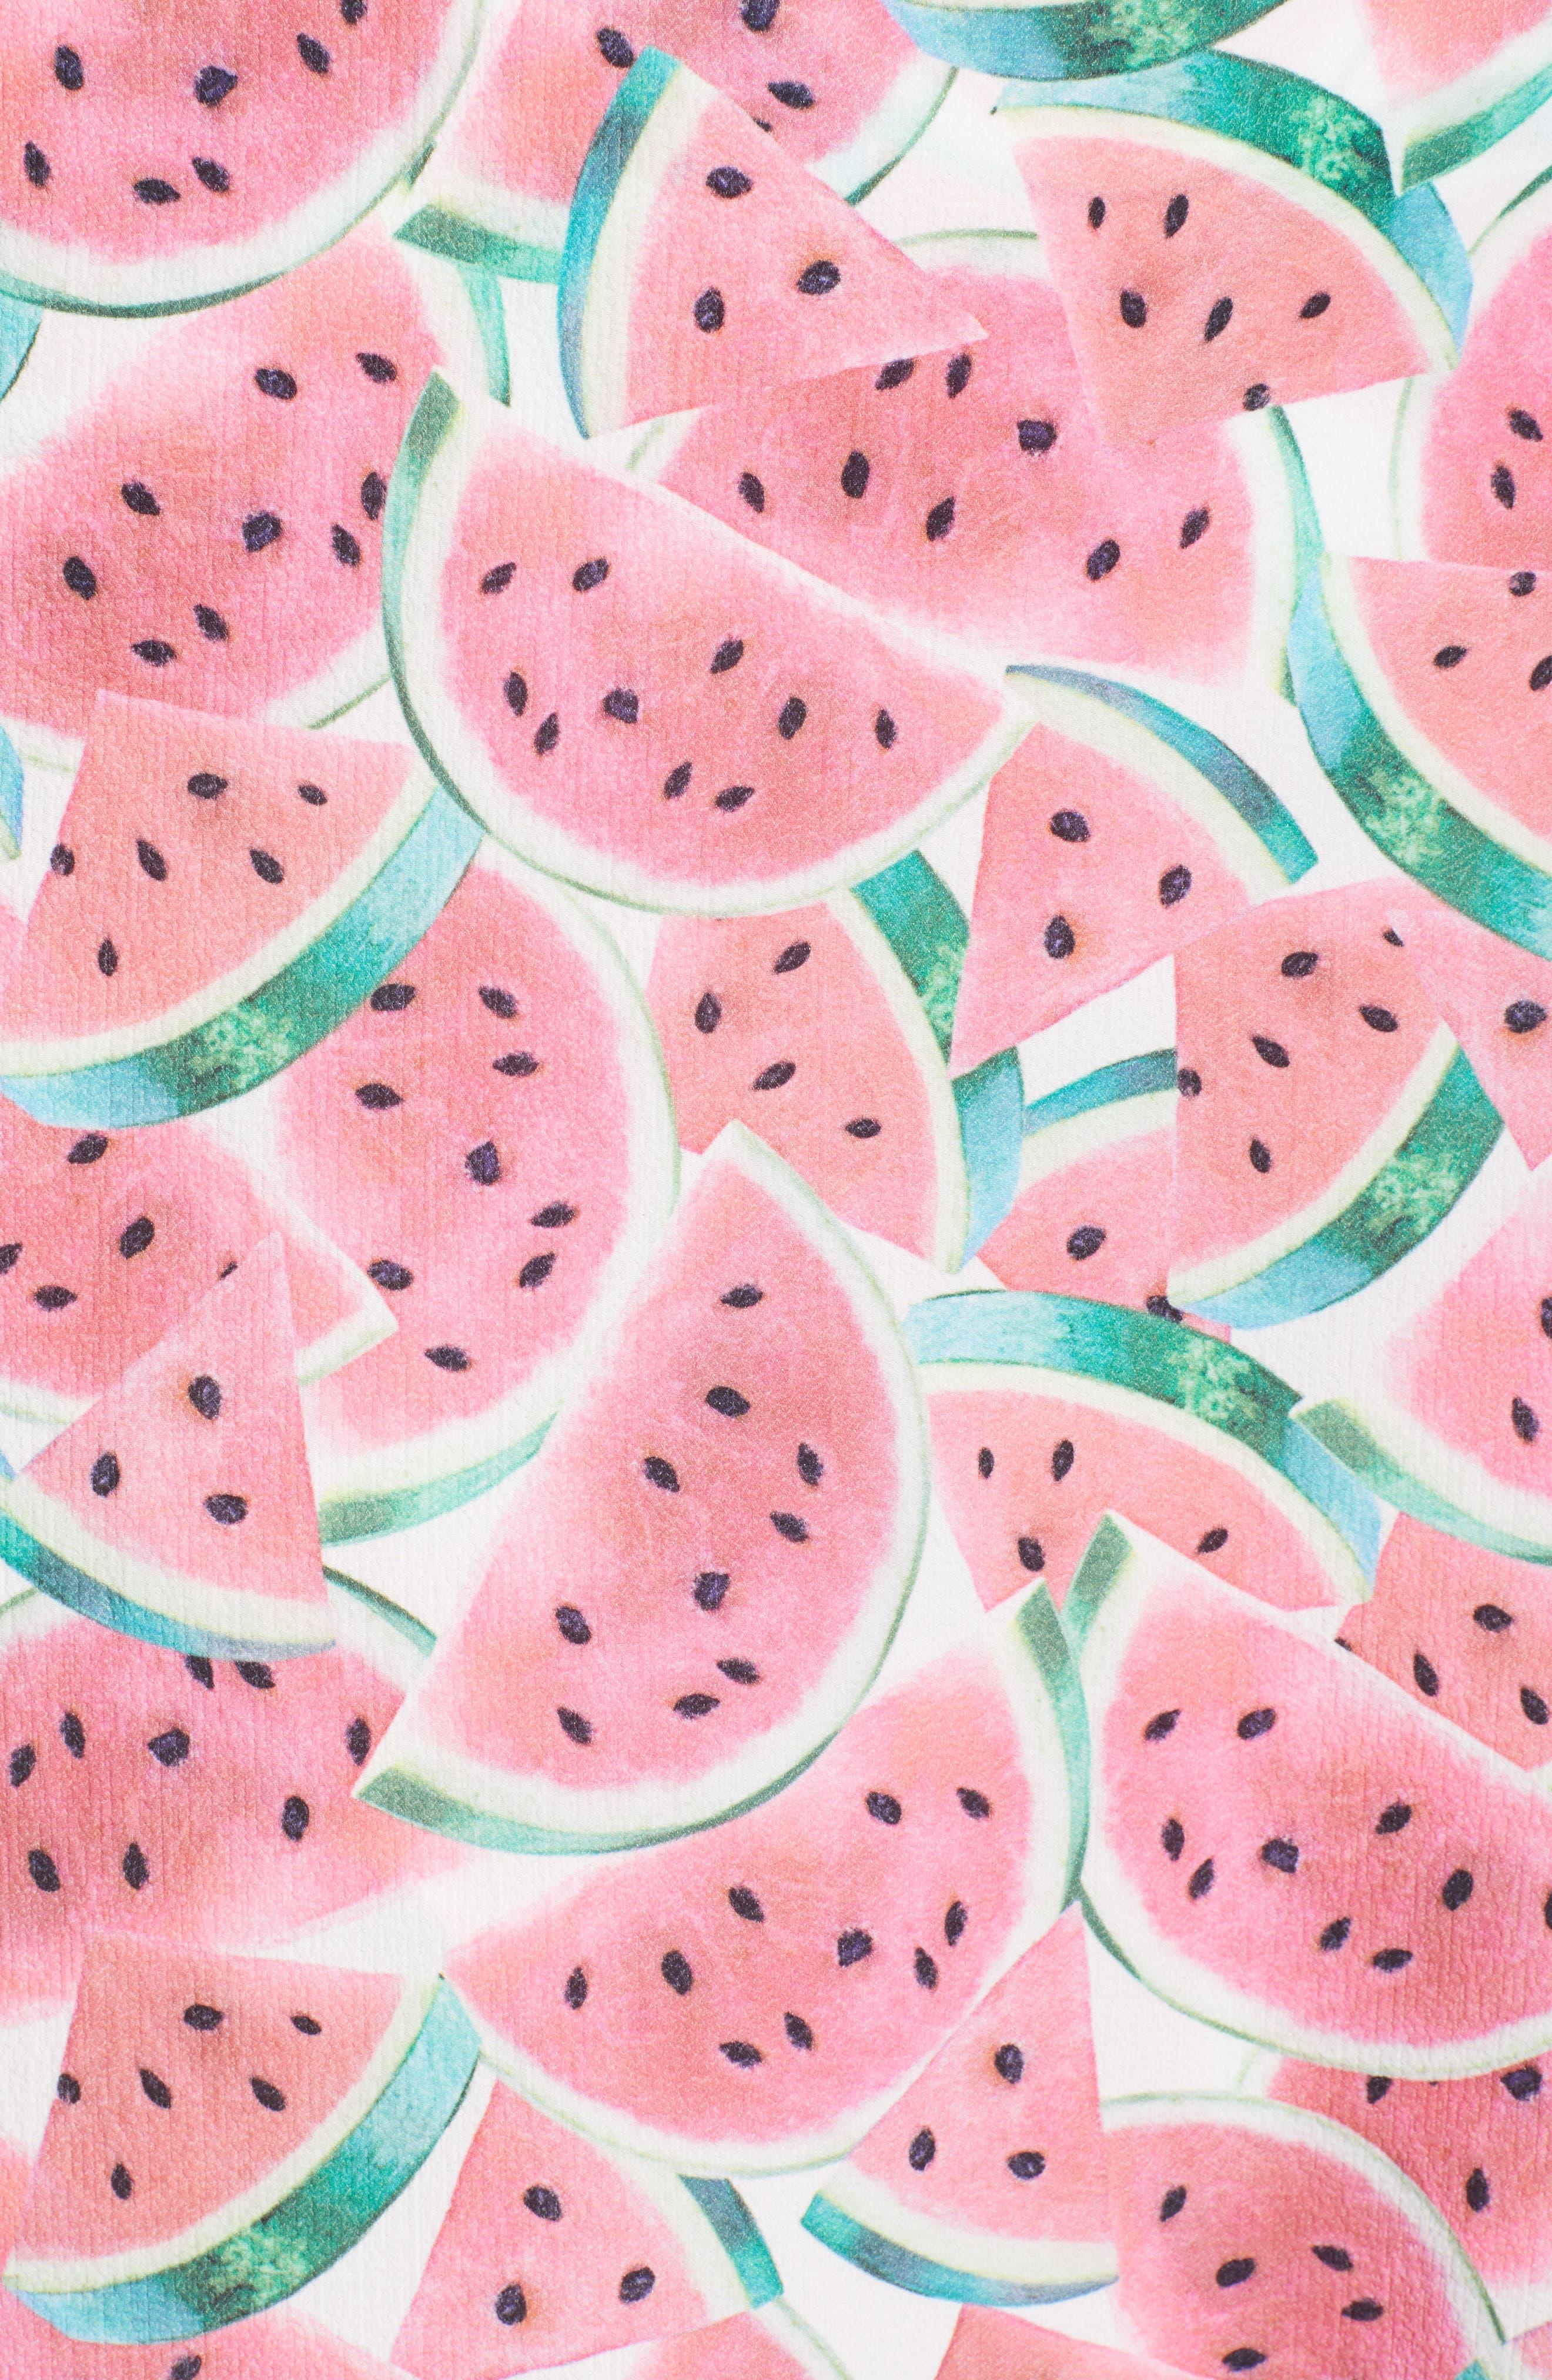 Flirt Midi Skirt,                             Alternate thumbnail 5, color,                             One In A Melon Crinkle Stretch